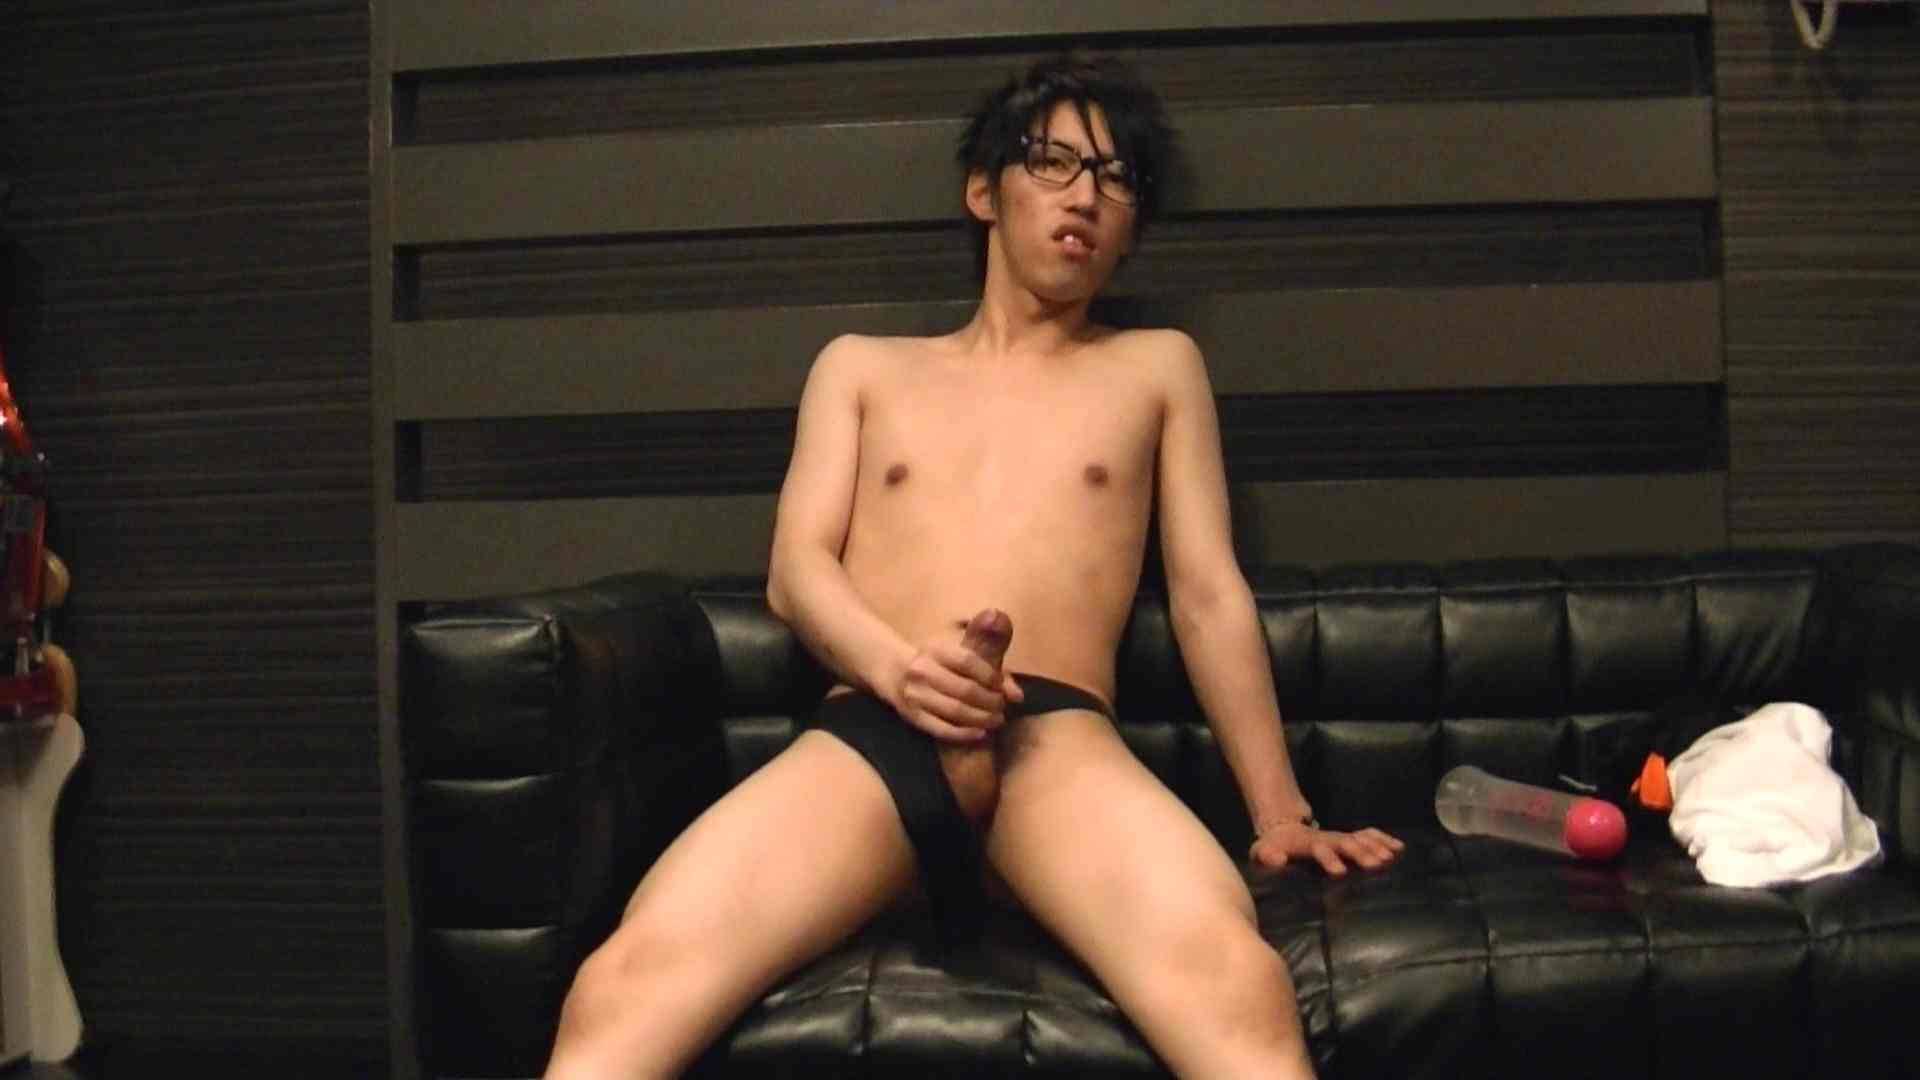 Mr.オナックスさん投稿!HD 貴方のオナニー三万円で撮影させてください。VOL.04 スリム美少年系ジャニ系 ゲイフリーエロ画像 12画像 10